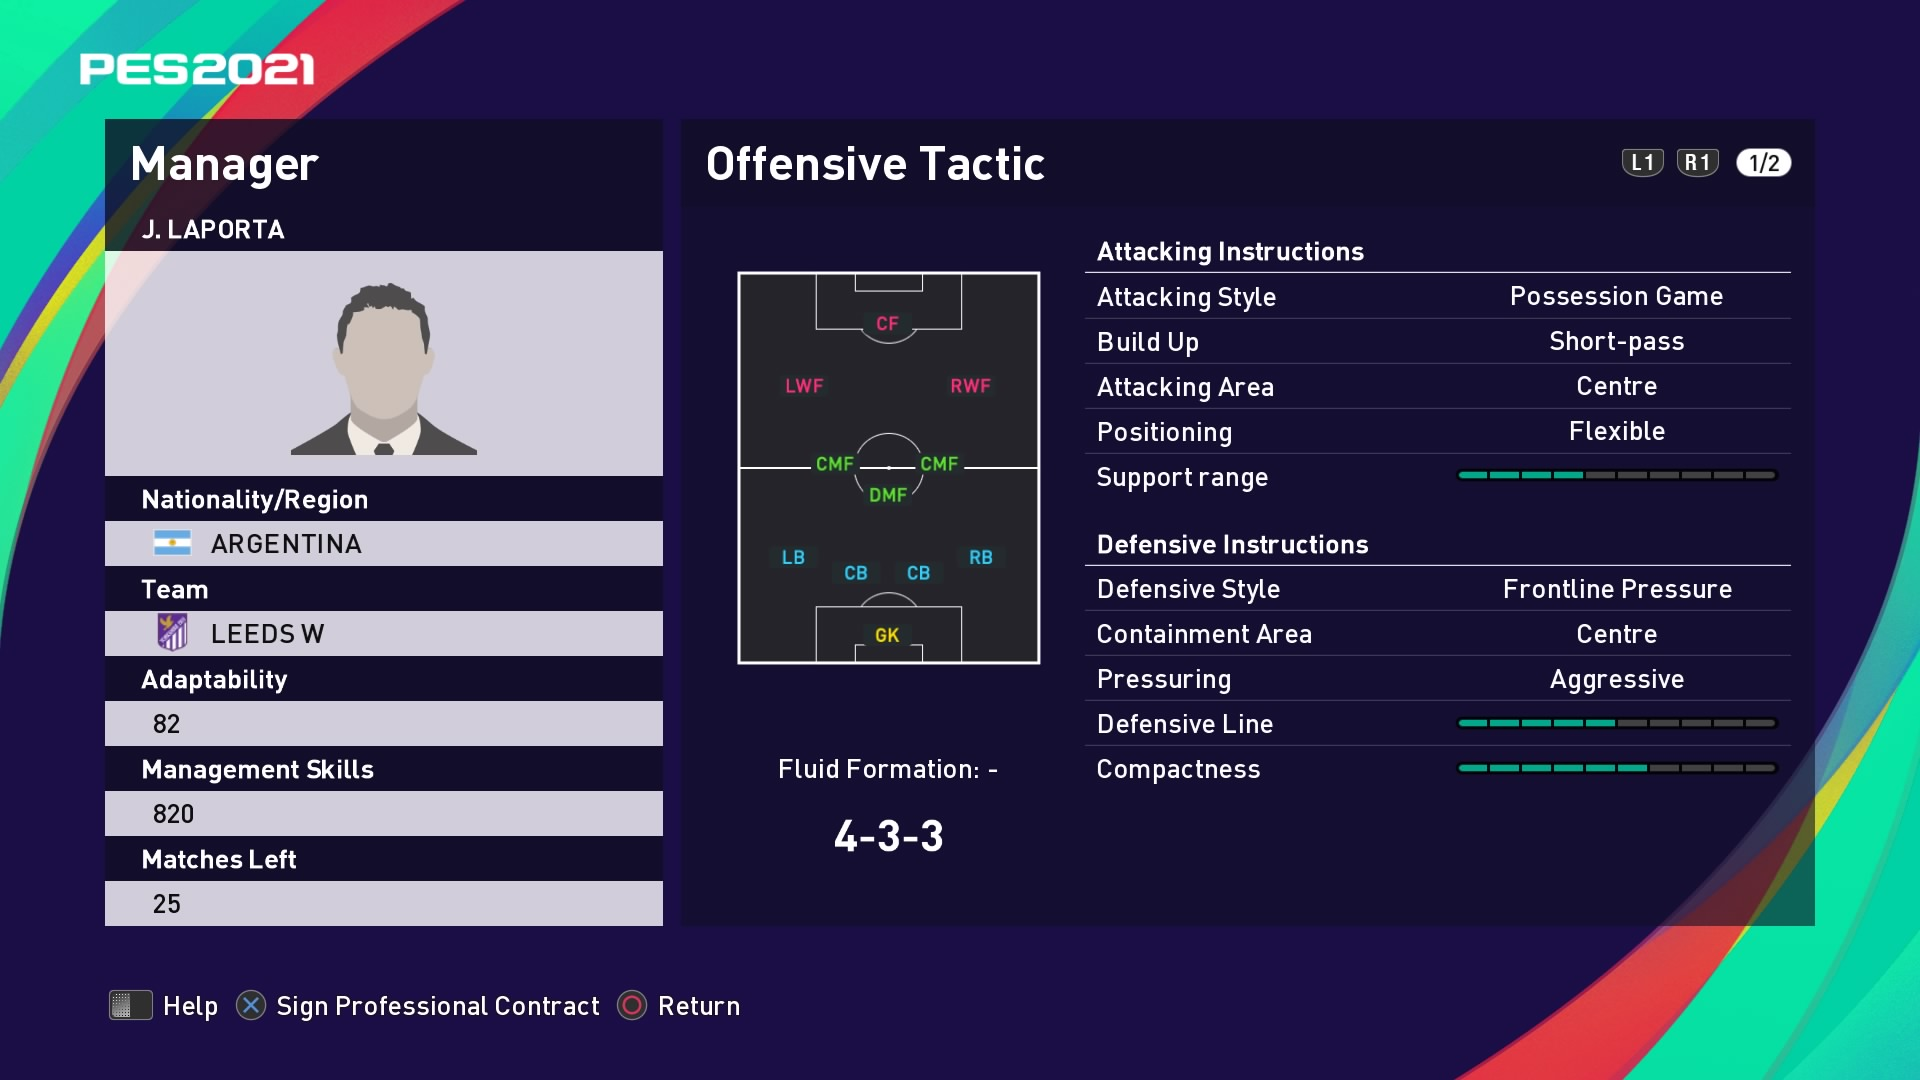 J. Laporta (Marcelo Bielsa) Offensive Tactic in PES 2021 myClub